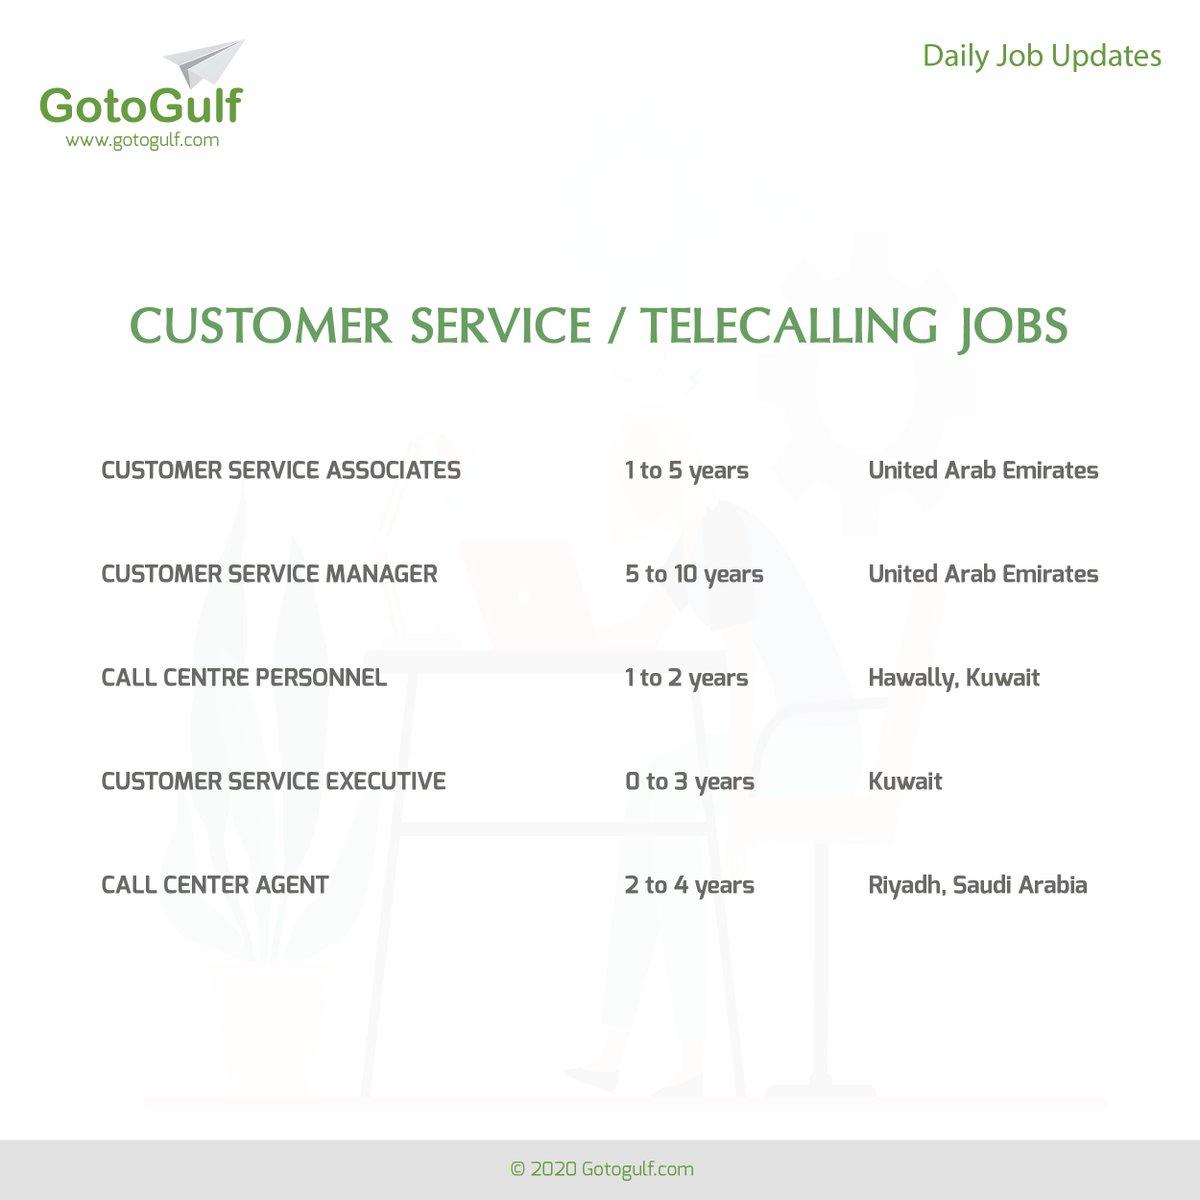 Click on the below link to apply for the job vacancies, https://t.co/fkKxdCt7mB  #gotogulf #jobs #middleeast #jobseeker #recruitment #telecalling #customer #service #call #center #agent #executive #personnel #manager #associate #saudiarabia #kuwait #uae #unitedarabemirates https://t.co/mcZGuHtWaP